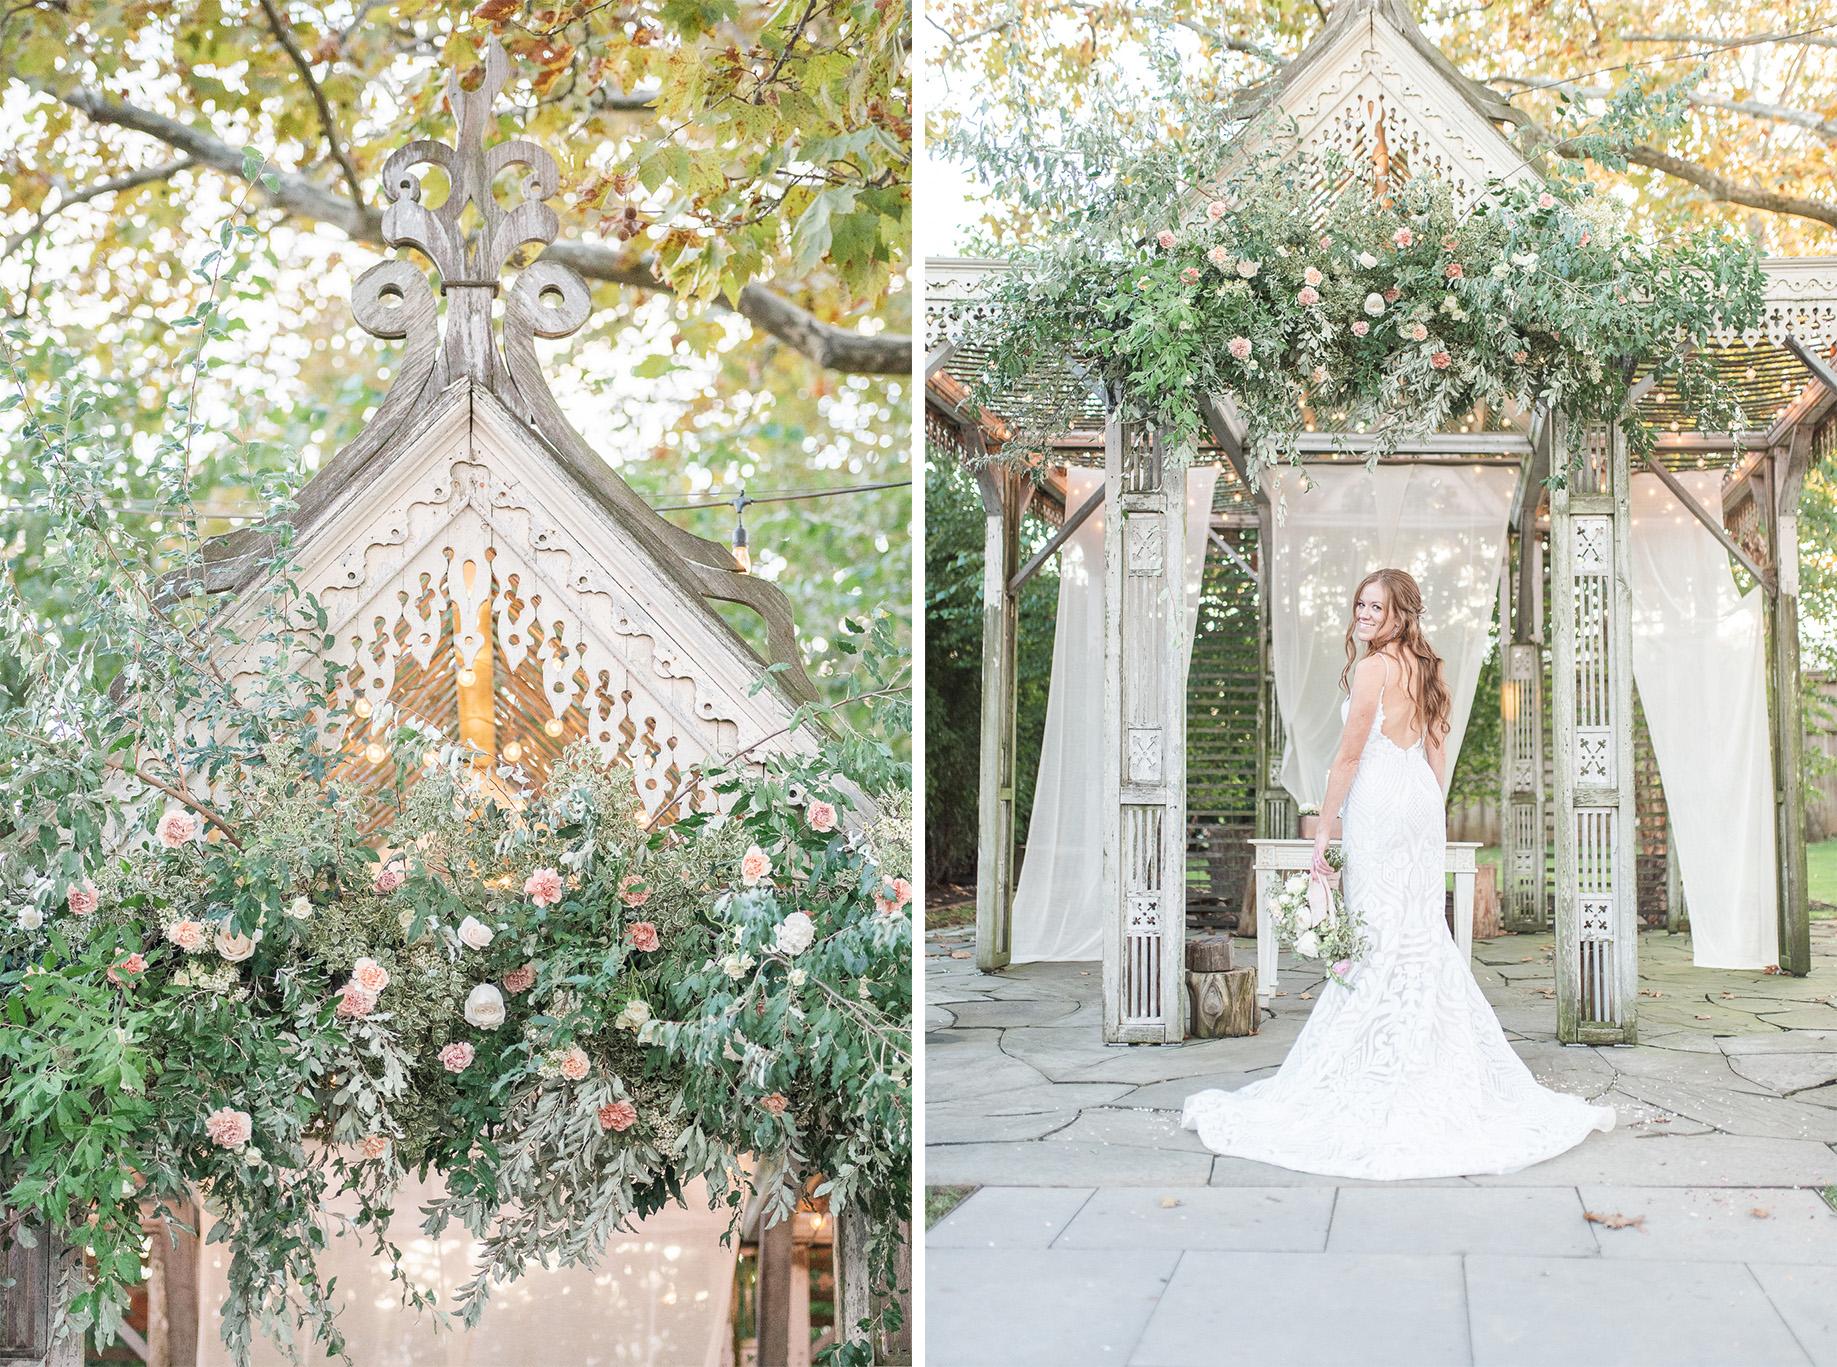 Caroline_and_Ryan_Wedding_Double_FOR_BLOG_1.jpg